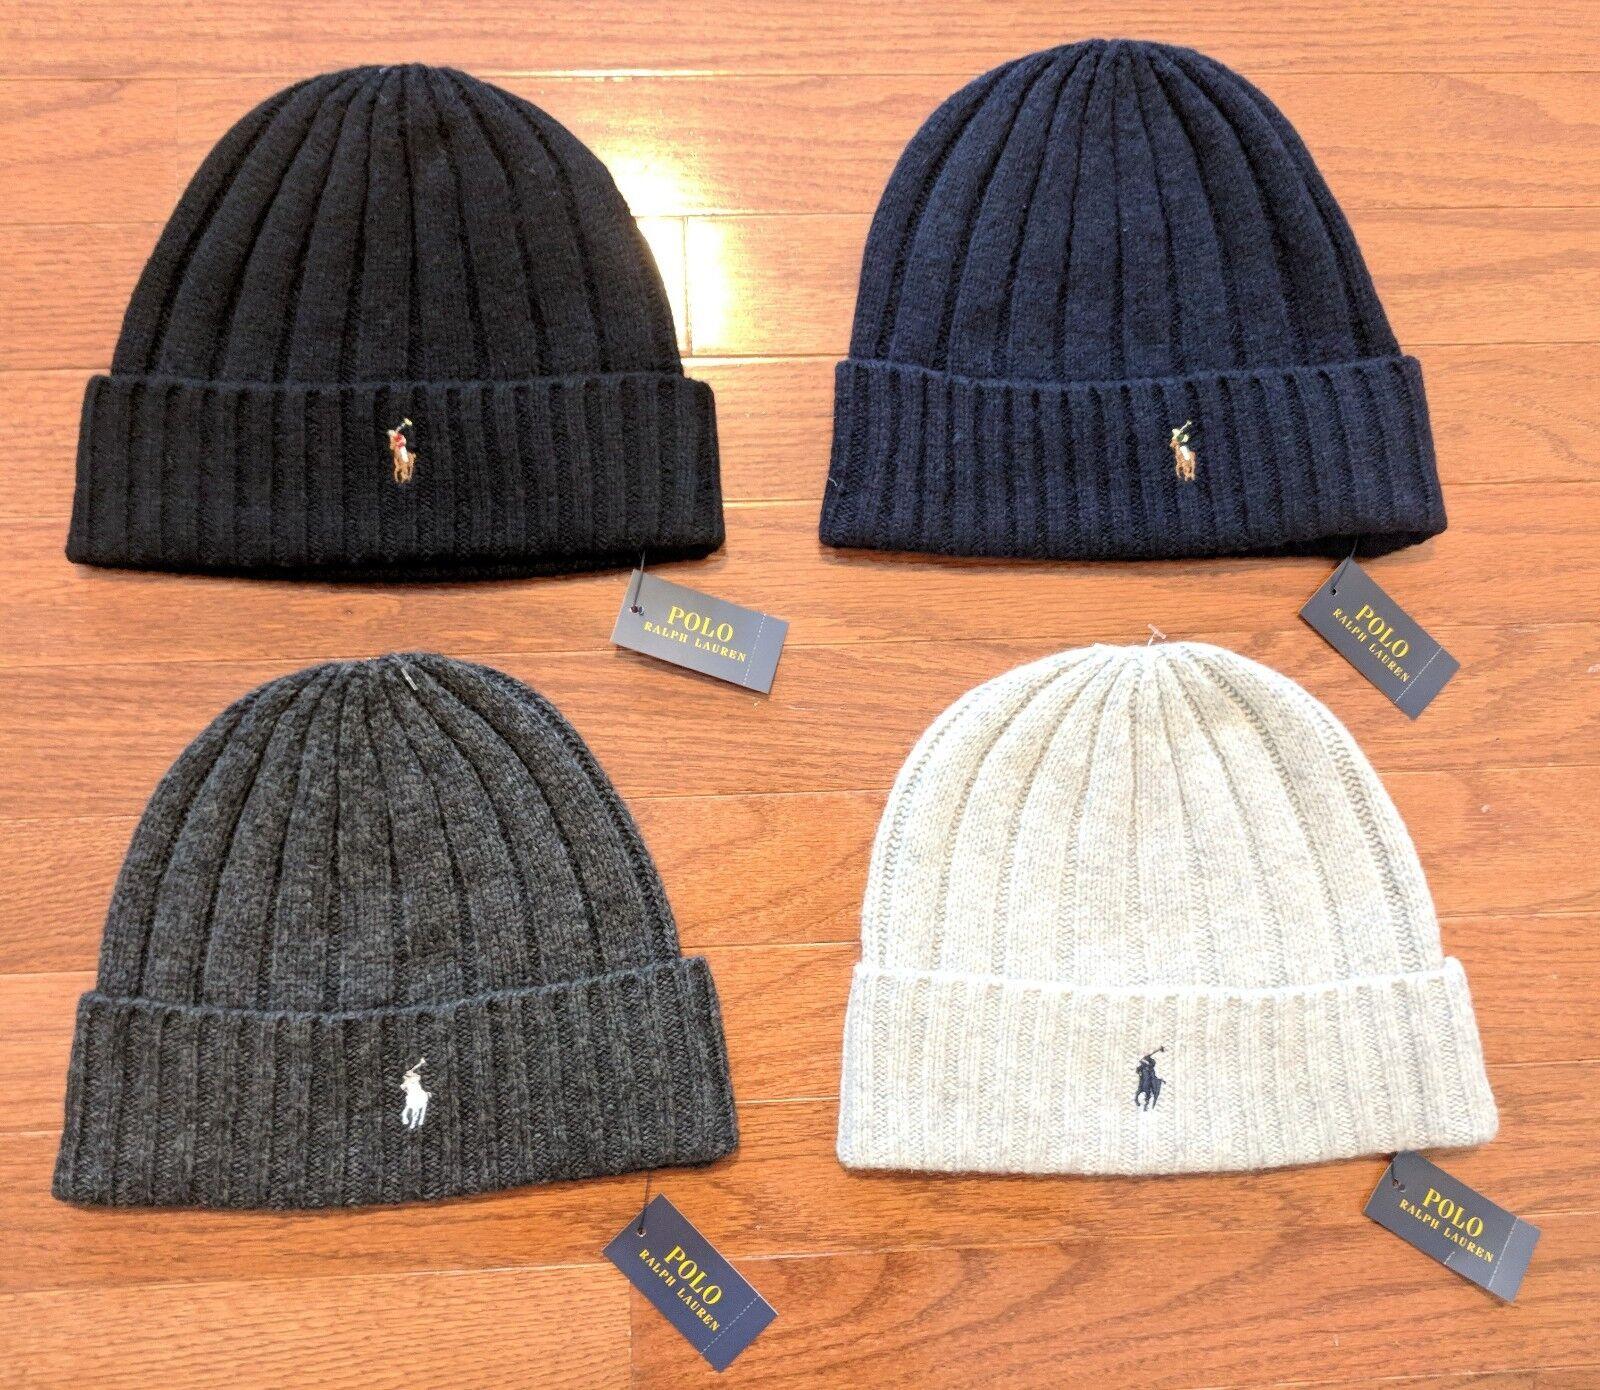 Polo Ralph Lauren Winter Cuffed Wool Ribbed Signature Small Logo Beanie  PP0054 아이템 넘버  183419960404.   1c7808349444